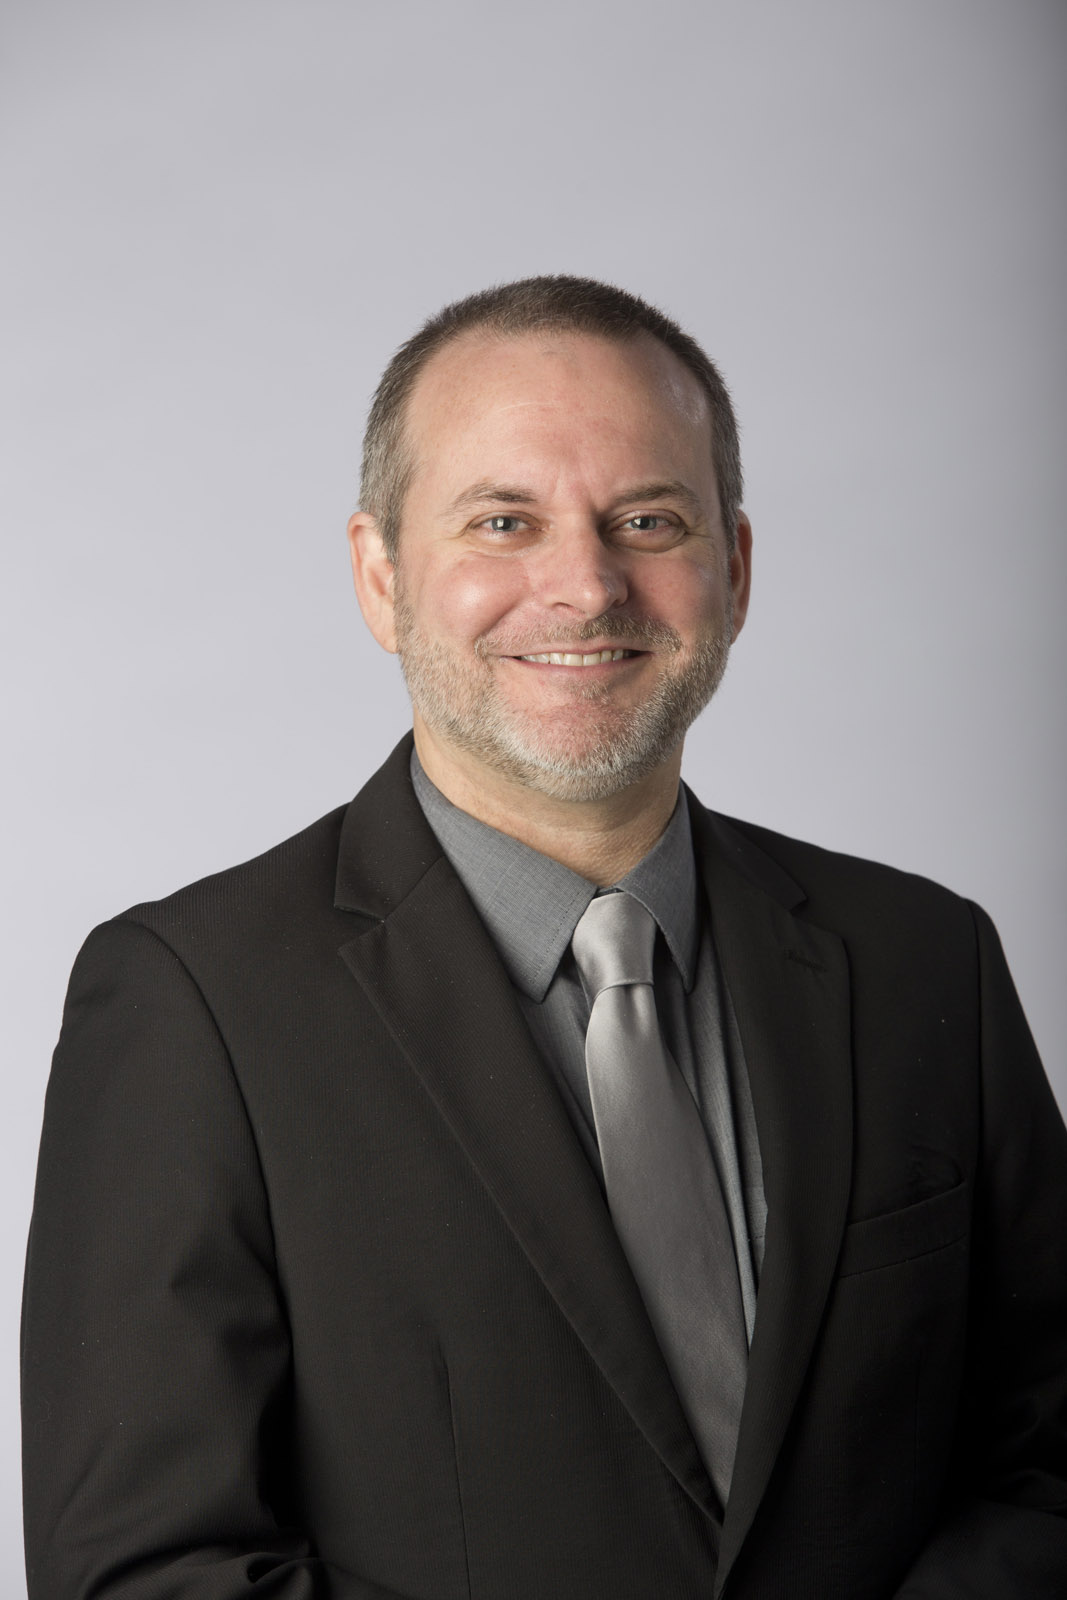 Dan McCleary